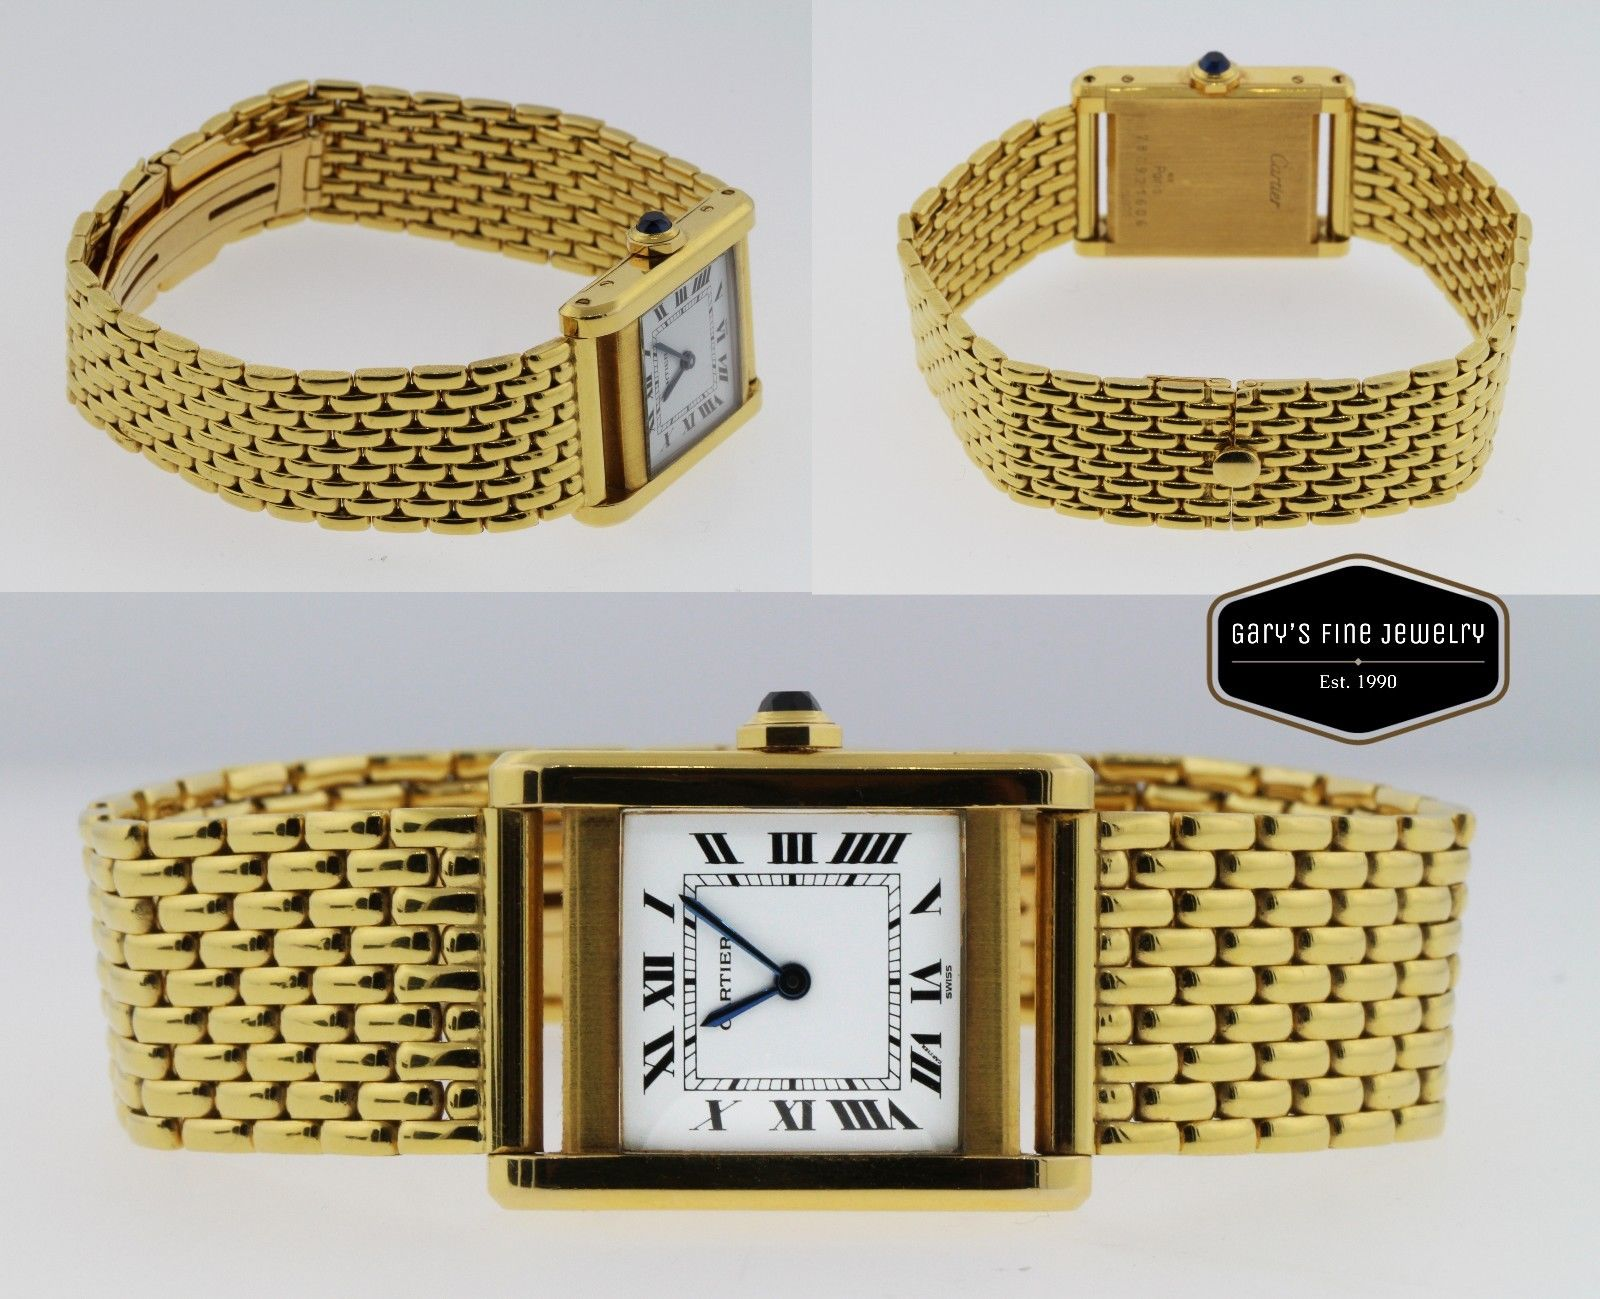 Cartier Tank 18K Solid Yellow Gold Vintage Unisex Watch Mesh Bracelet White Dial